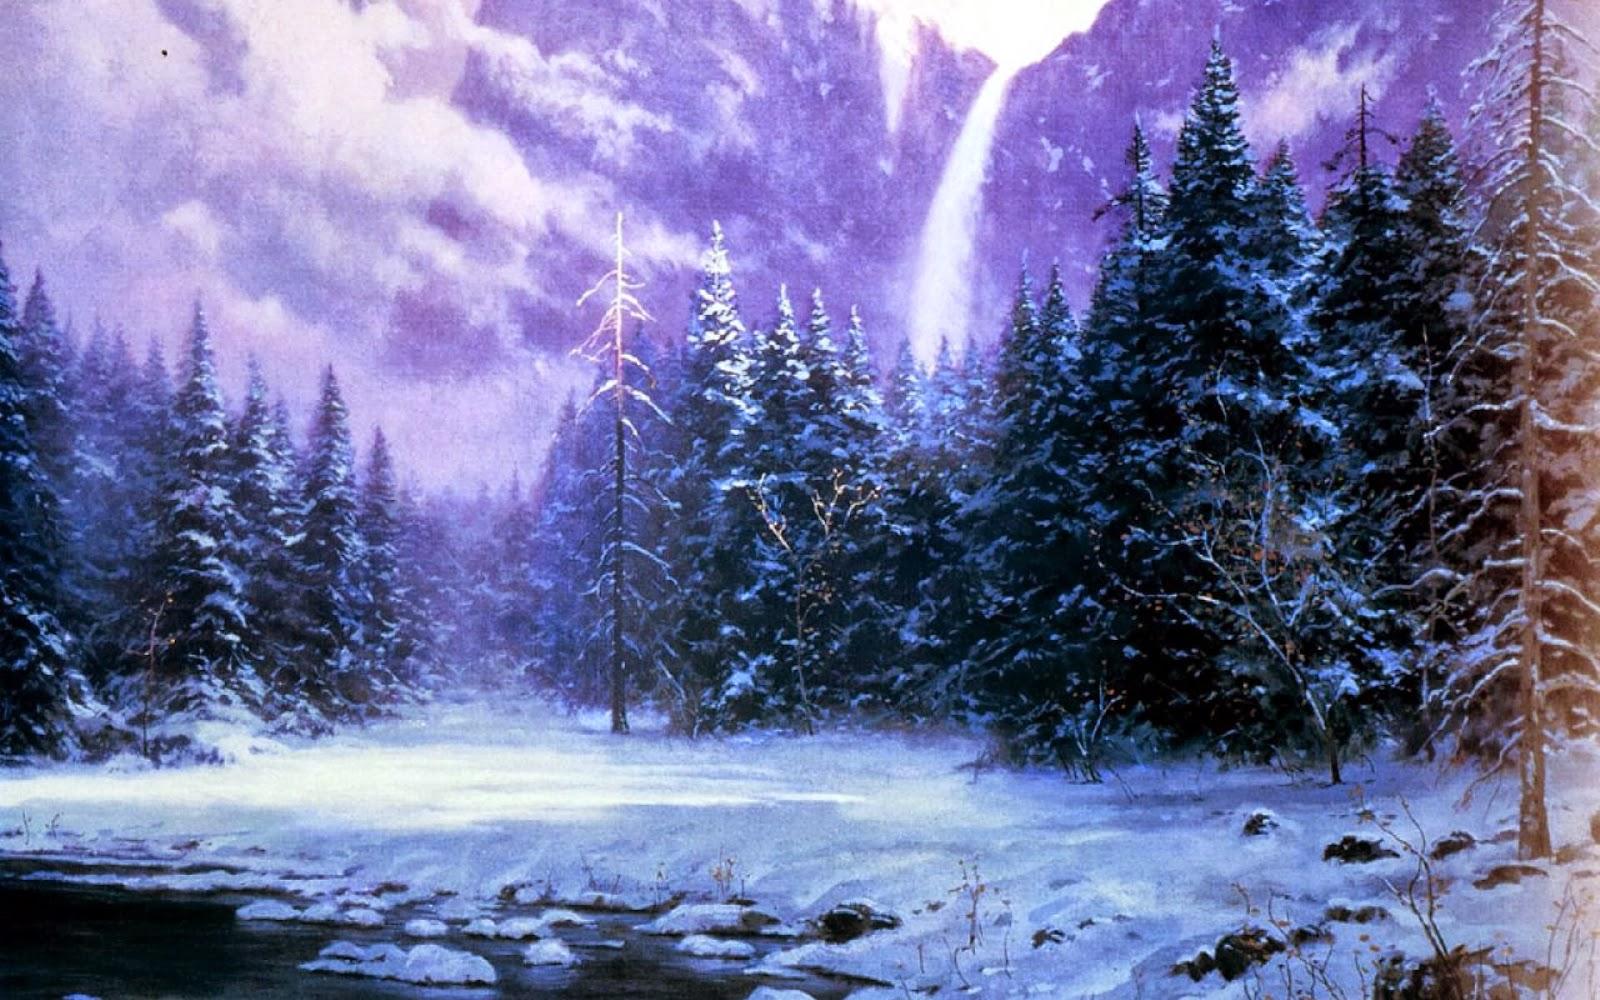 Fondo Escritorio Paisaje Nevada En Cumbre: Fondo De Pantalla Paisaje Bosque De Nieve